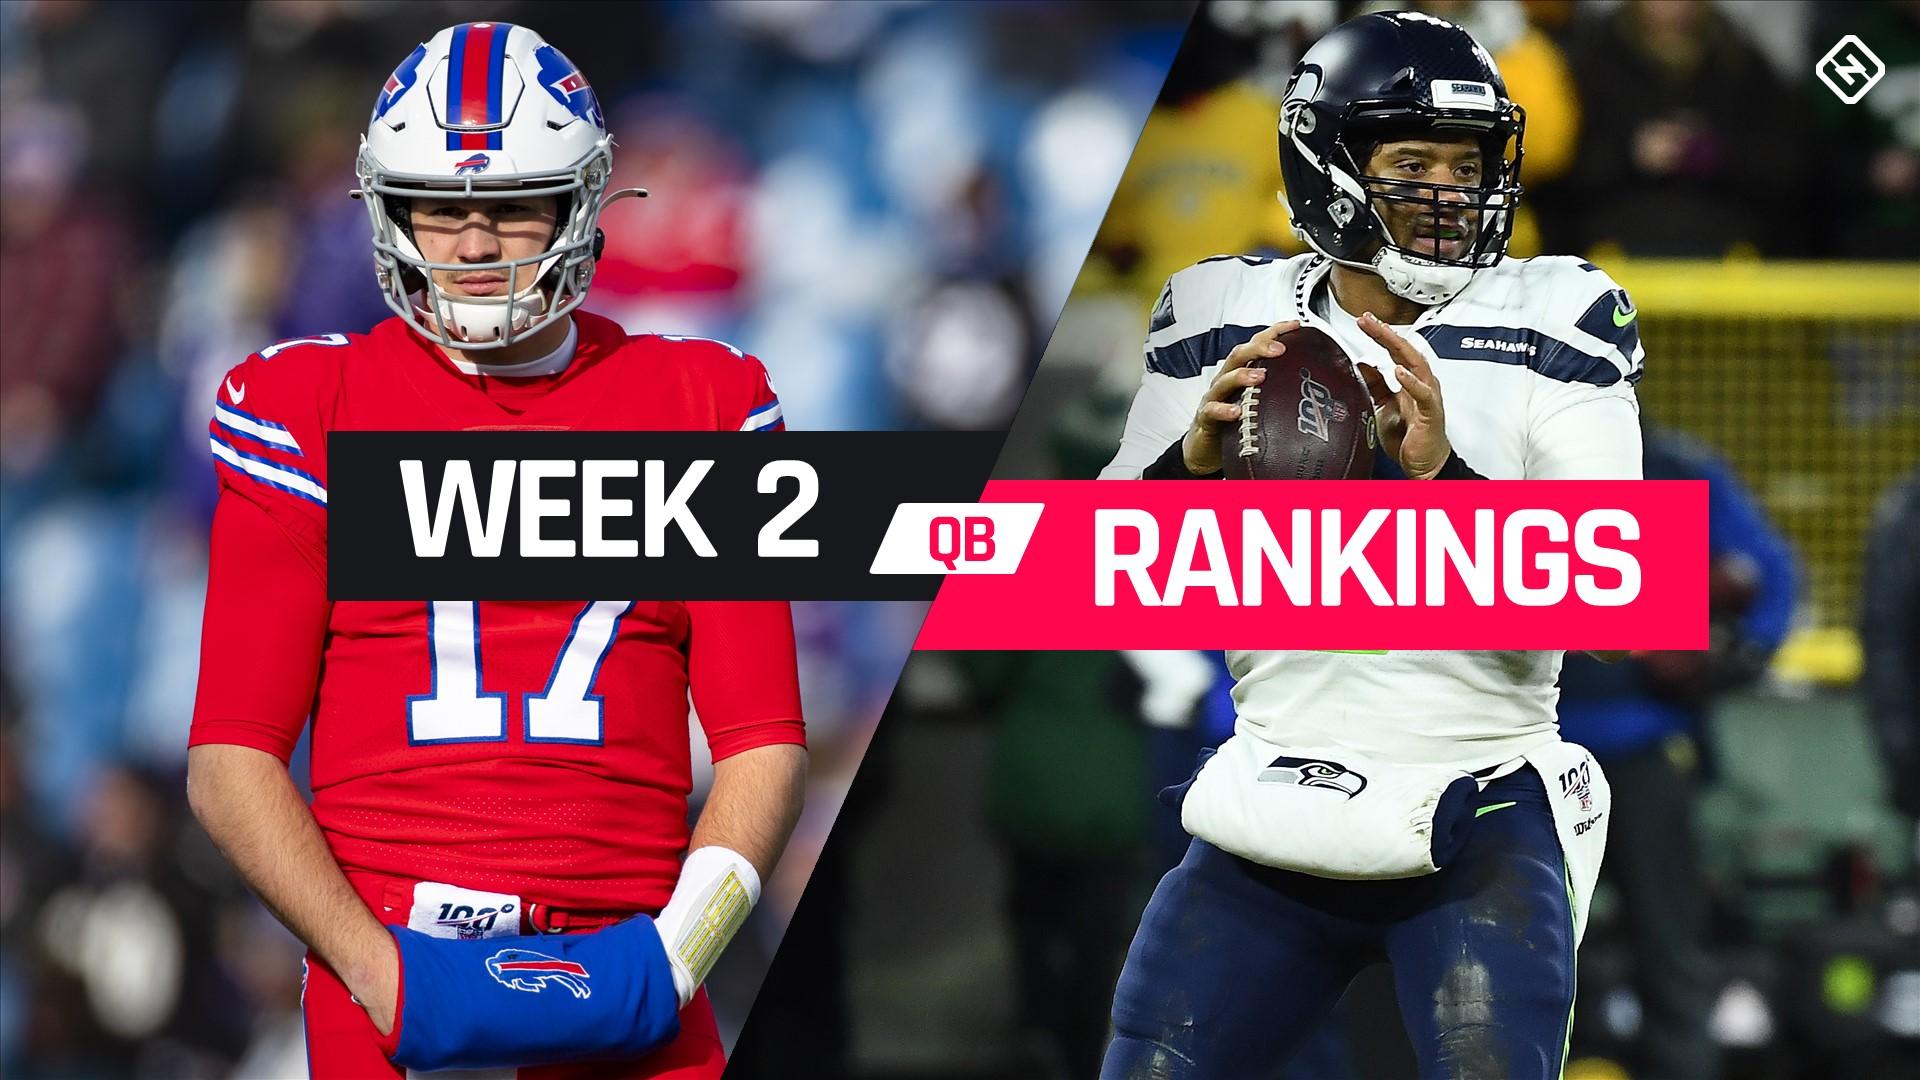 Week 2 Fantasy QB Rankings: Must-starts, sleepers, potential busts at quarterback 1